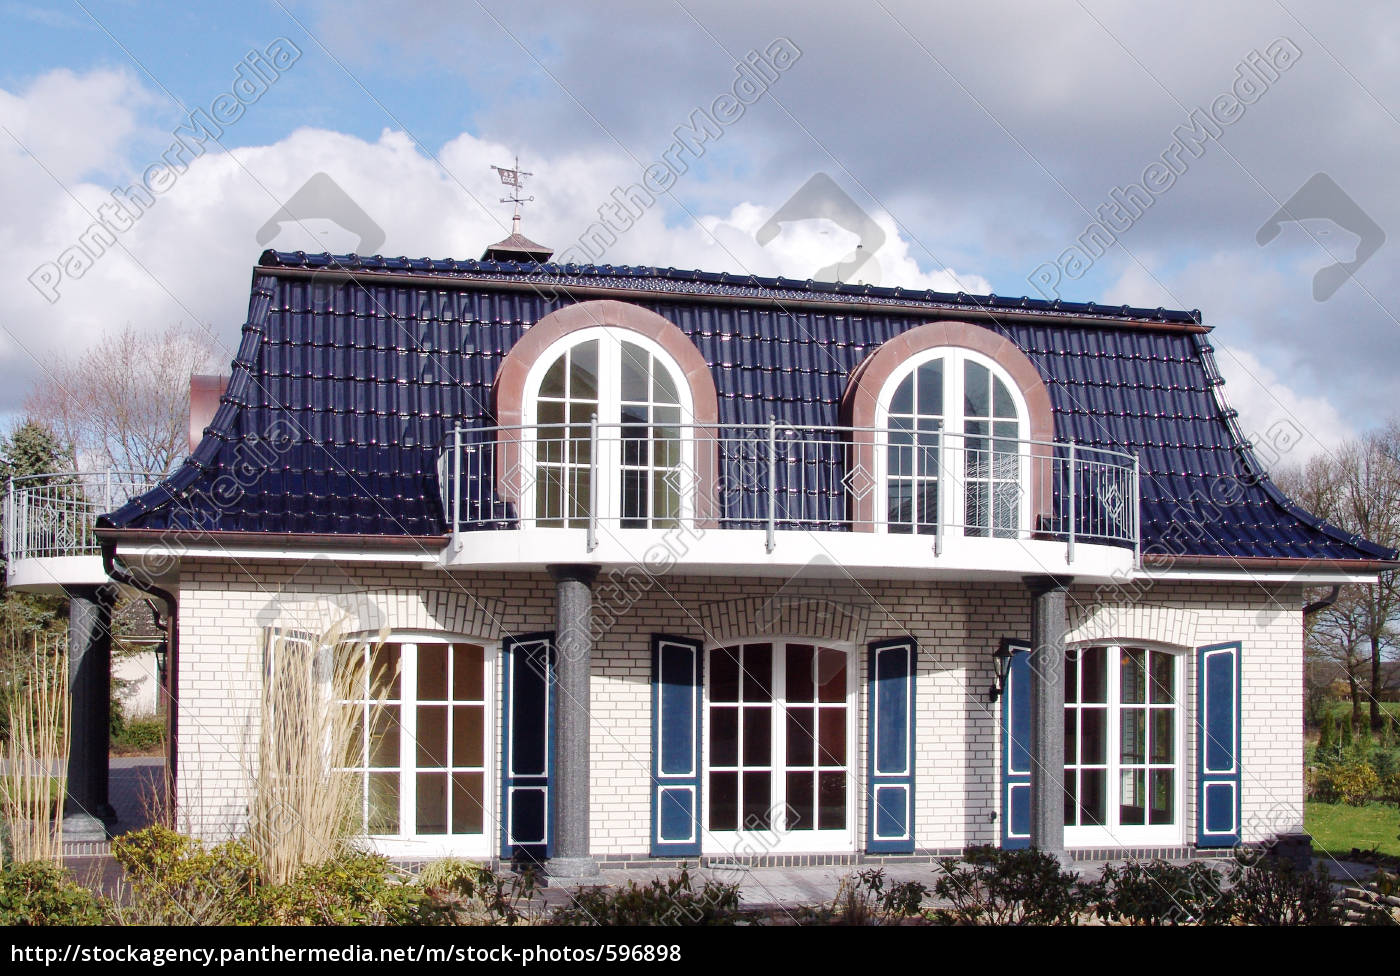 dream, house - 596898